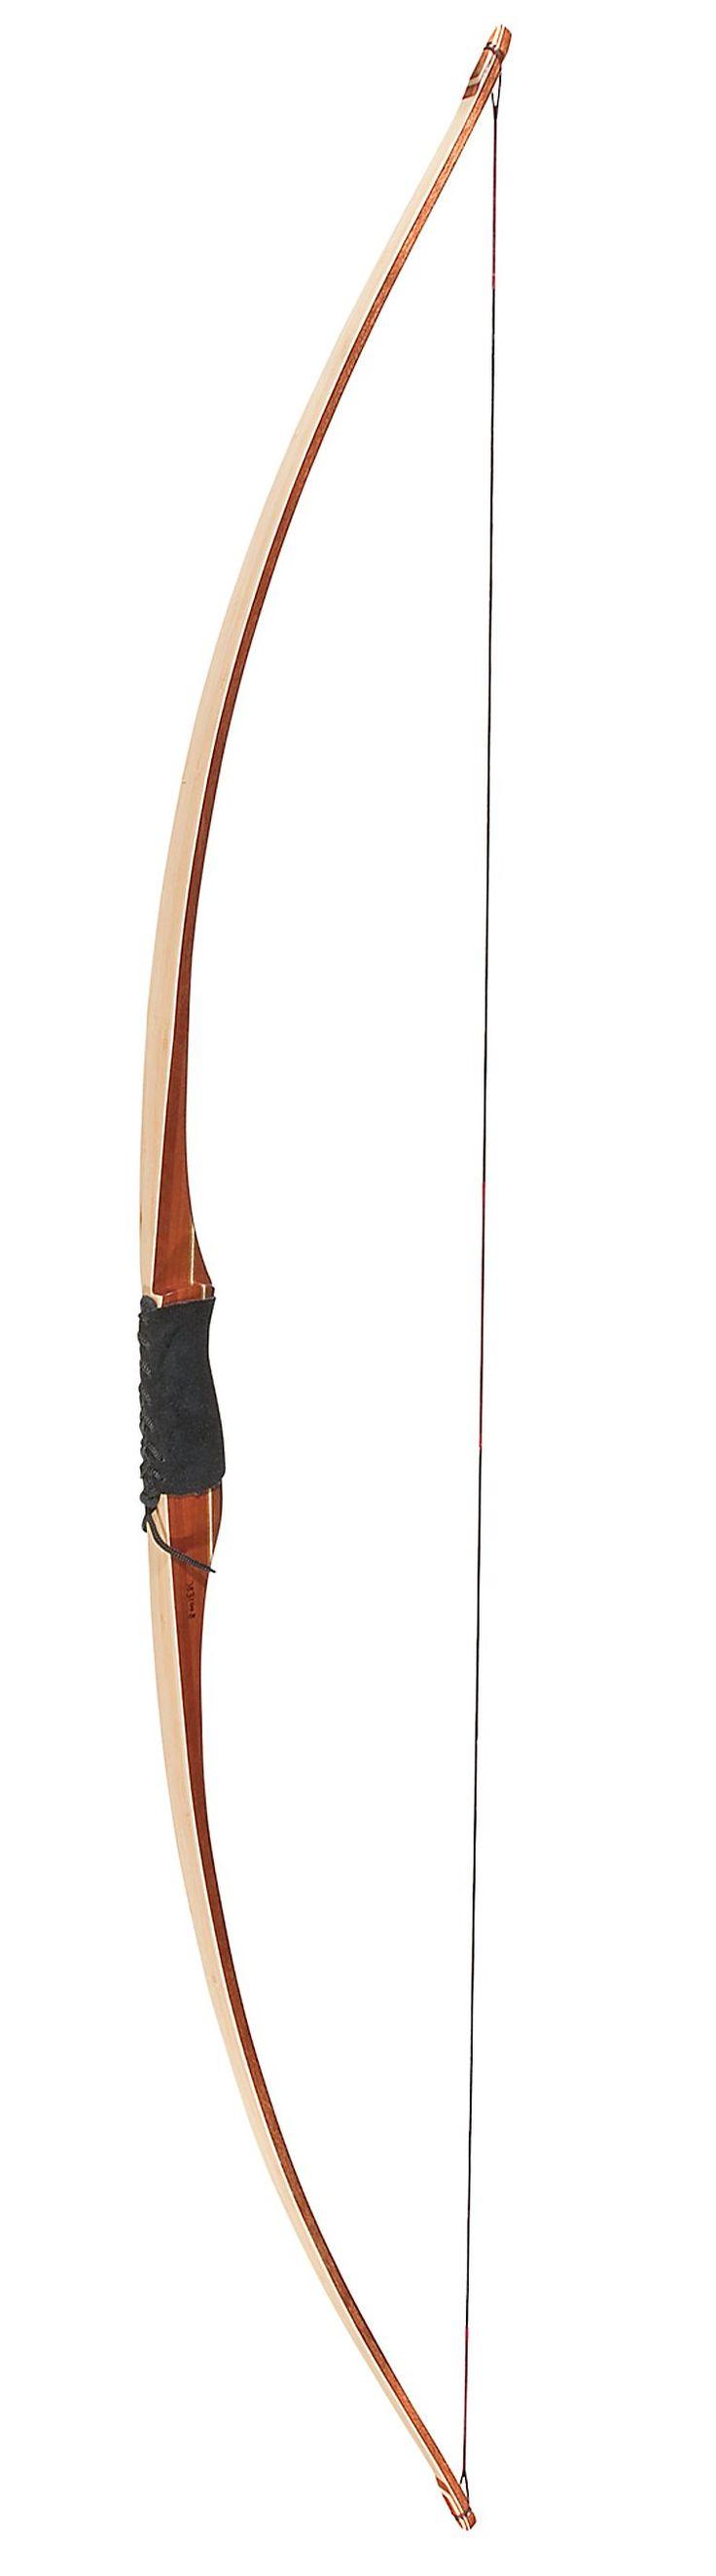 PSE® Archery Sequoia™ Longbow | Bass Pro Shops